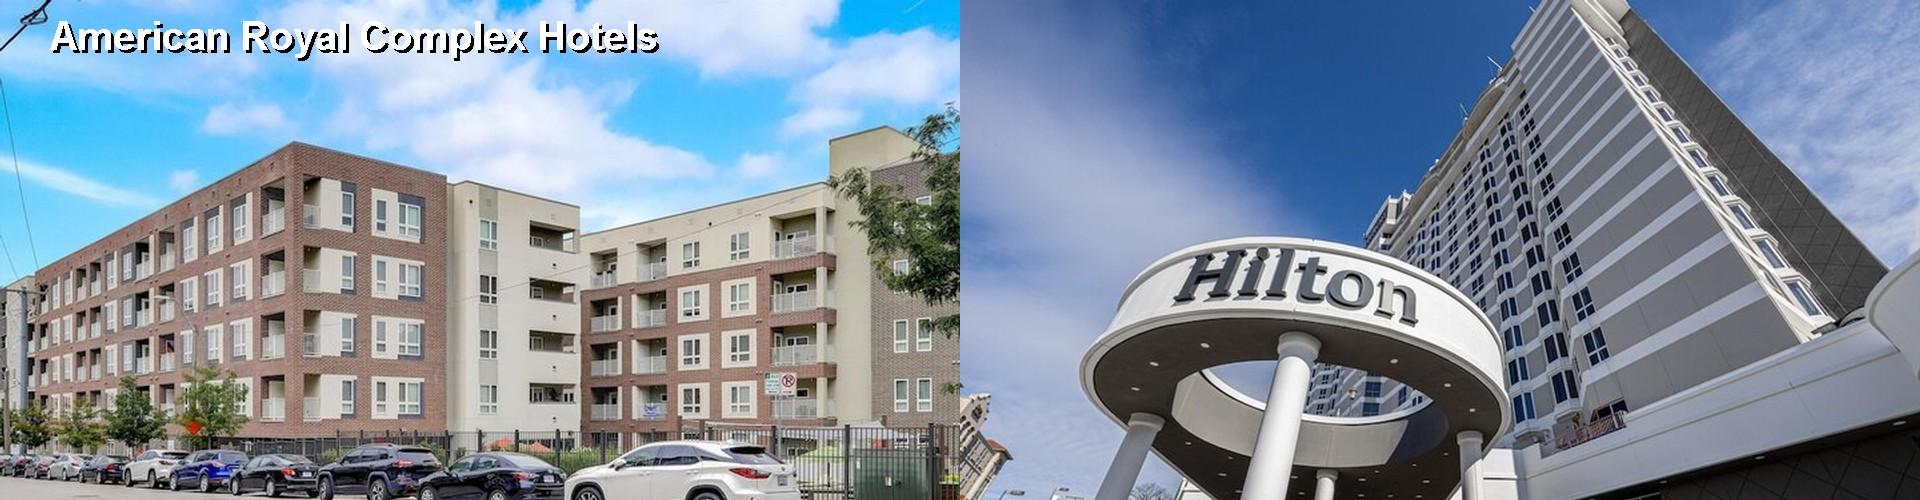 $46+ Hotels Near American Royal Complex in Kansas City KS